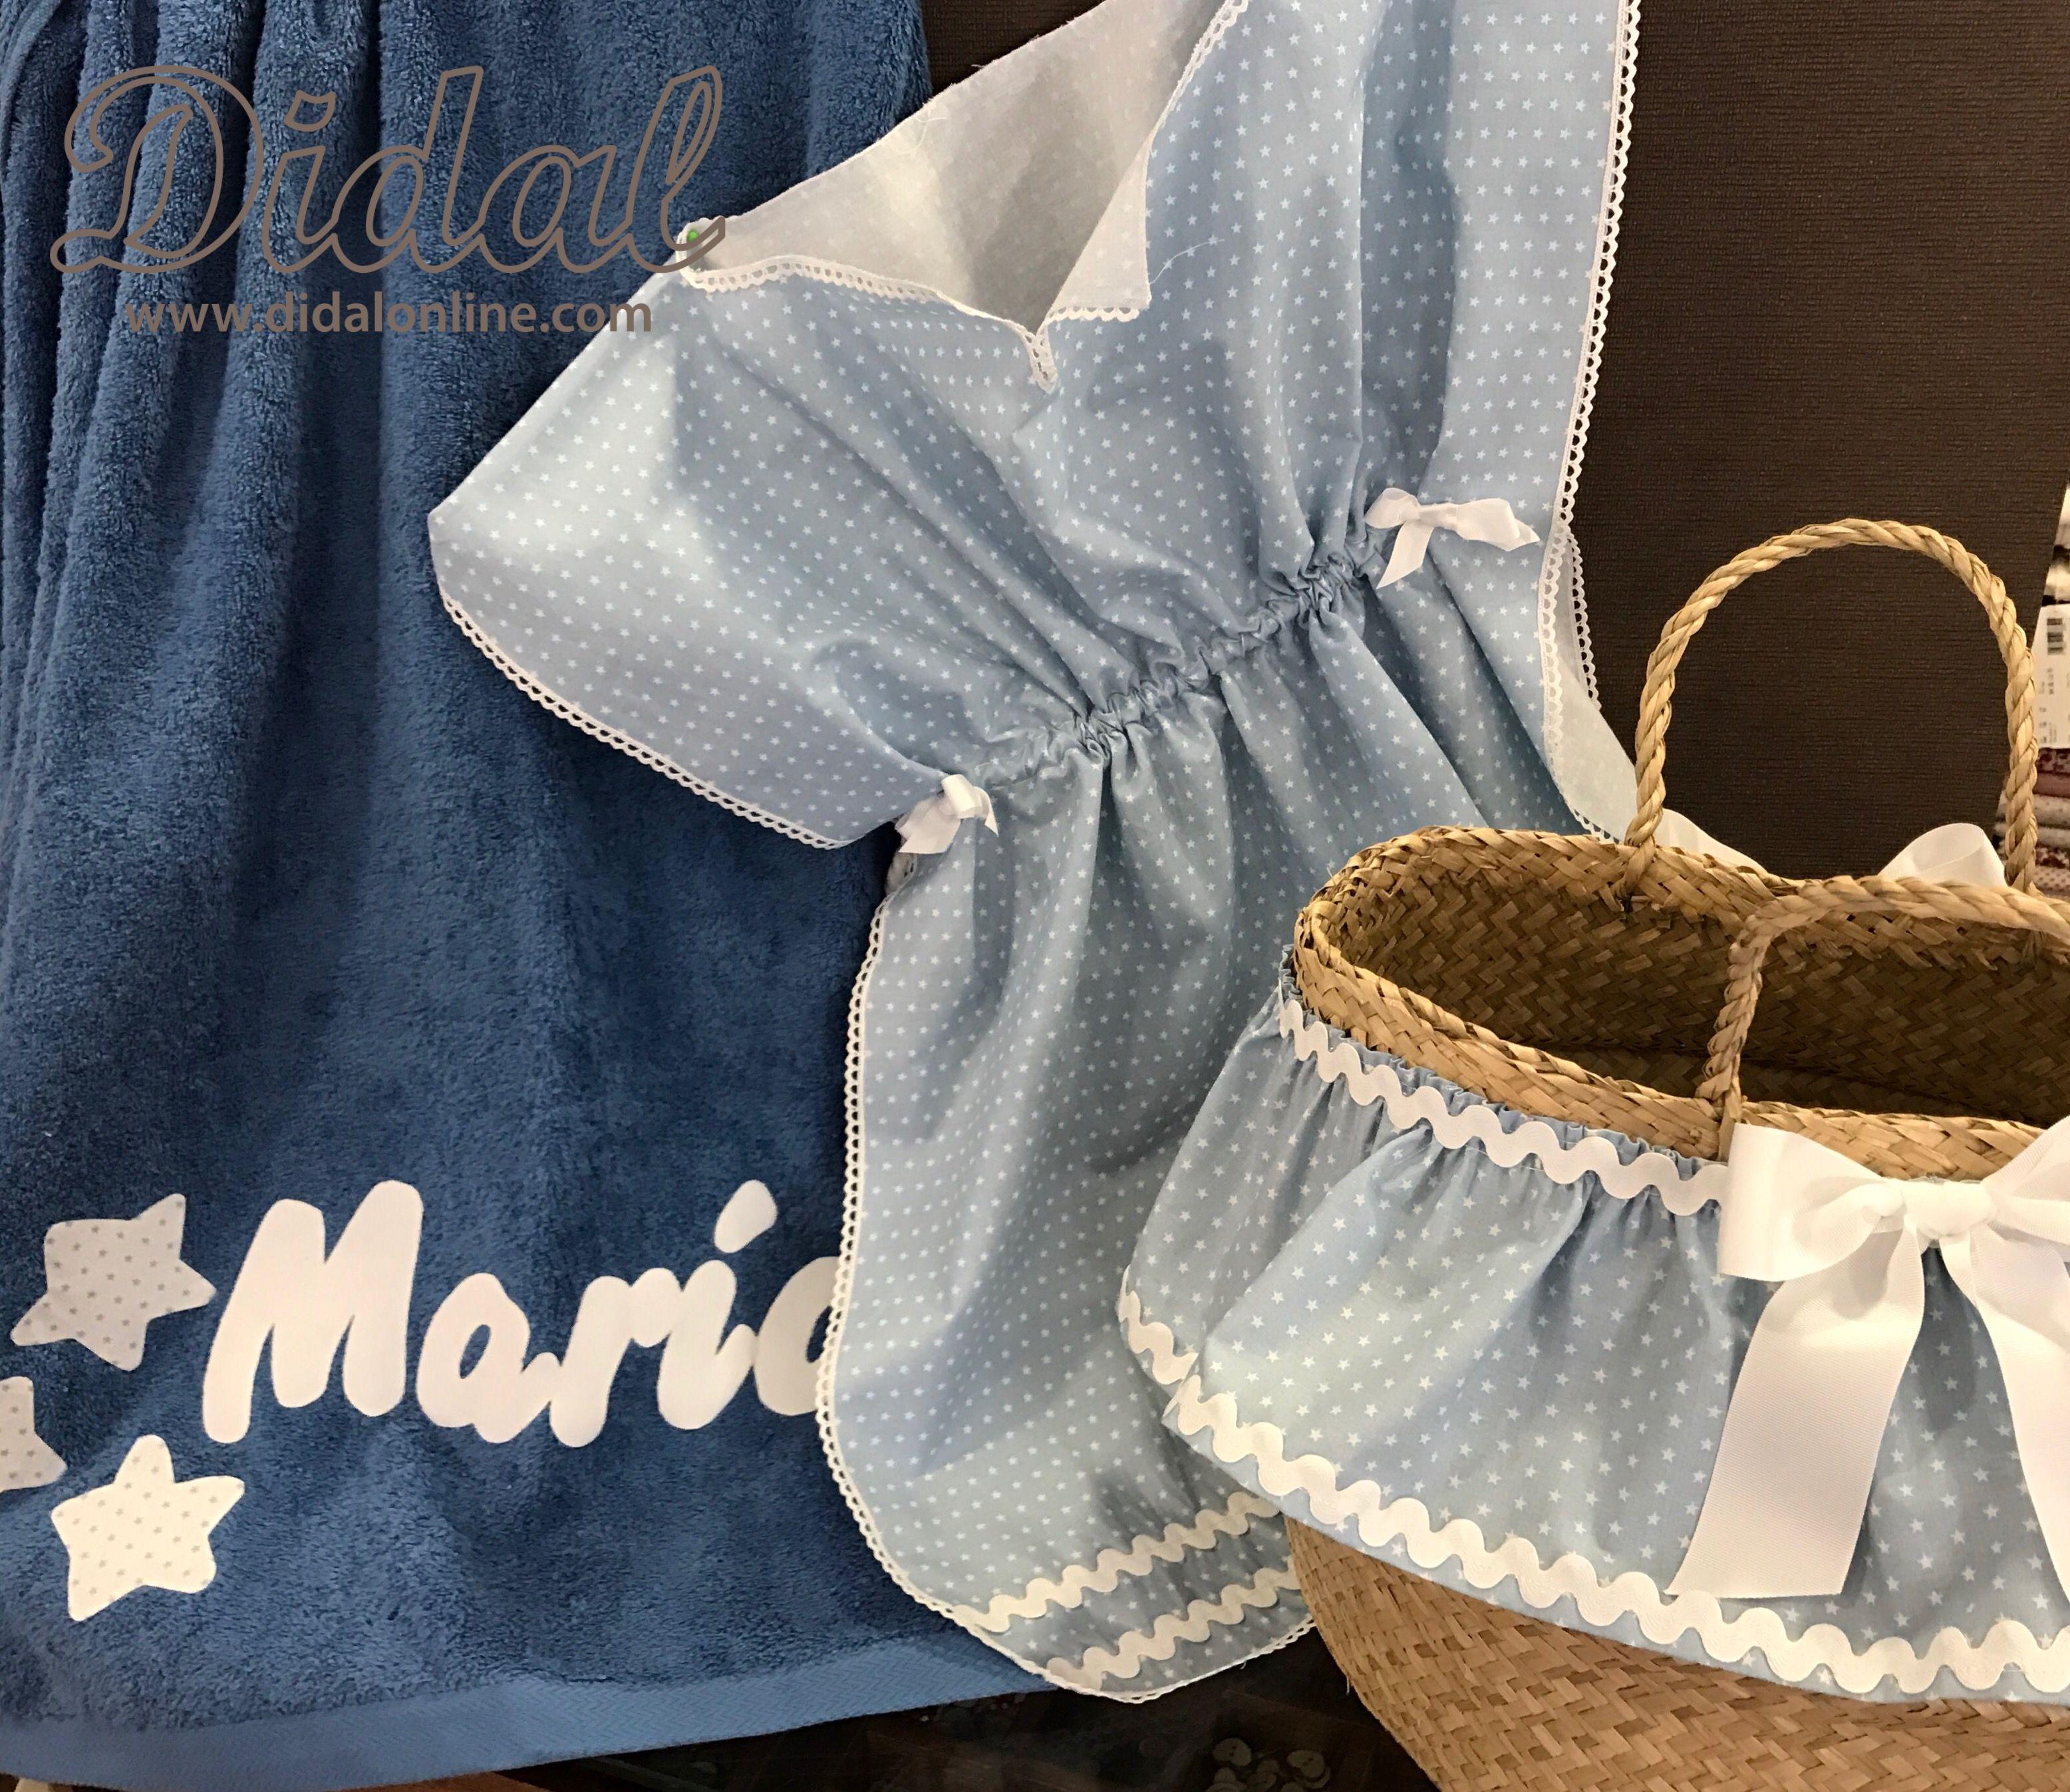 Pin De Encarni Guerrero En Costura Peques Vestidos Para Niñas Accesorios De Verano Ropa